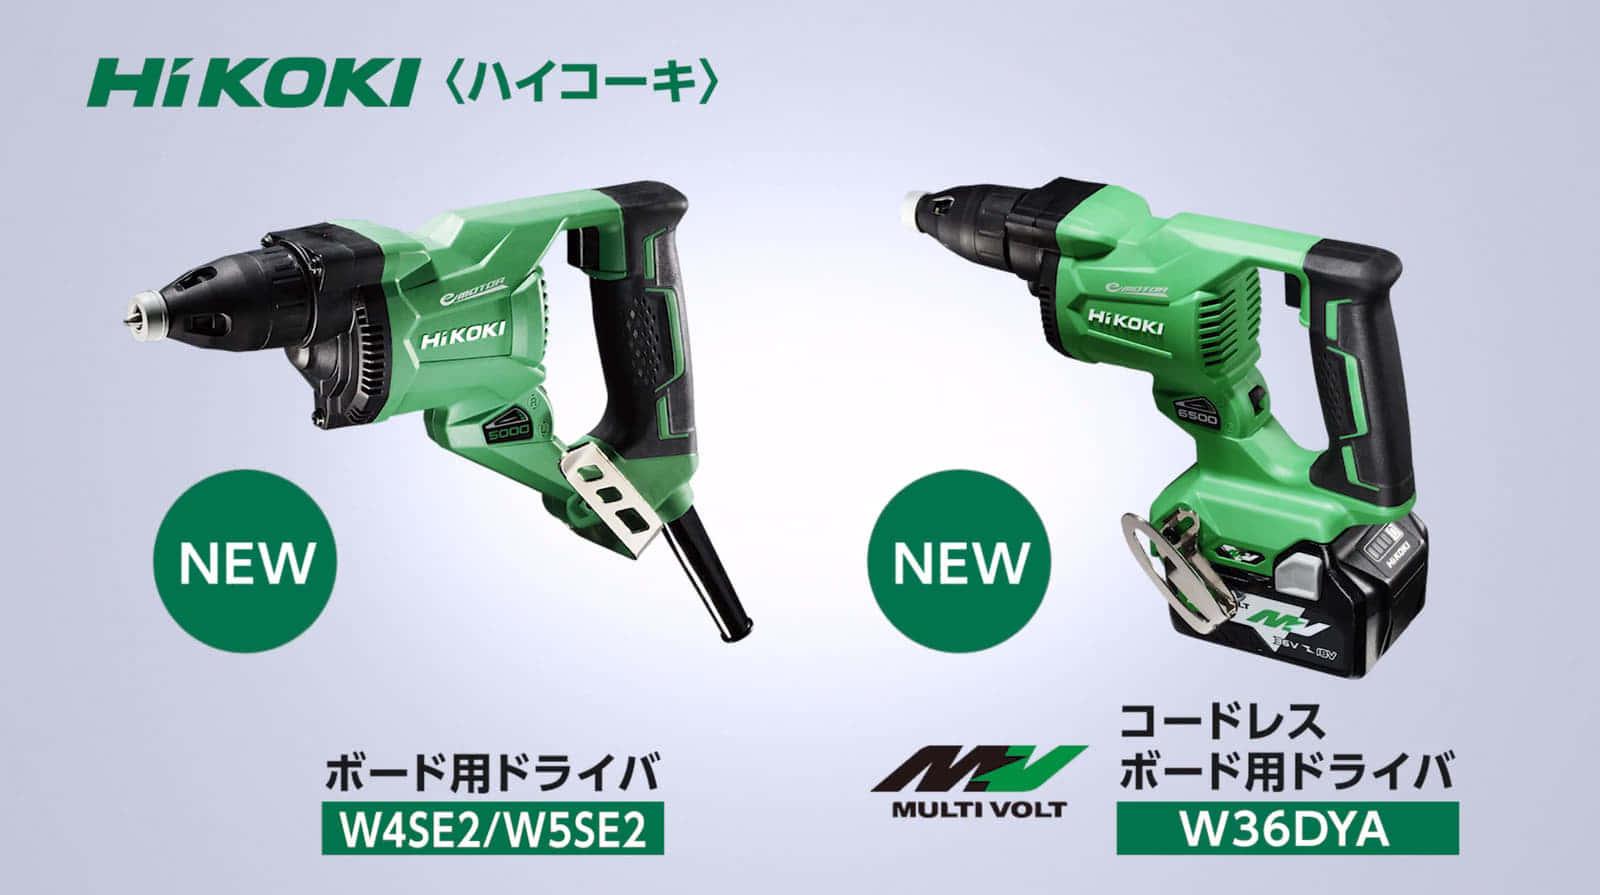 HiKOKI W4SE2 ボード用ドライバ 使い勝手と耐久性がUP